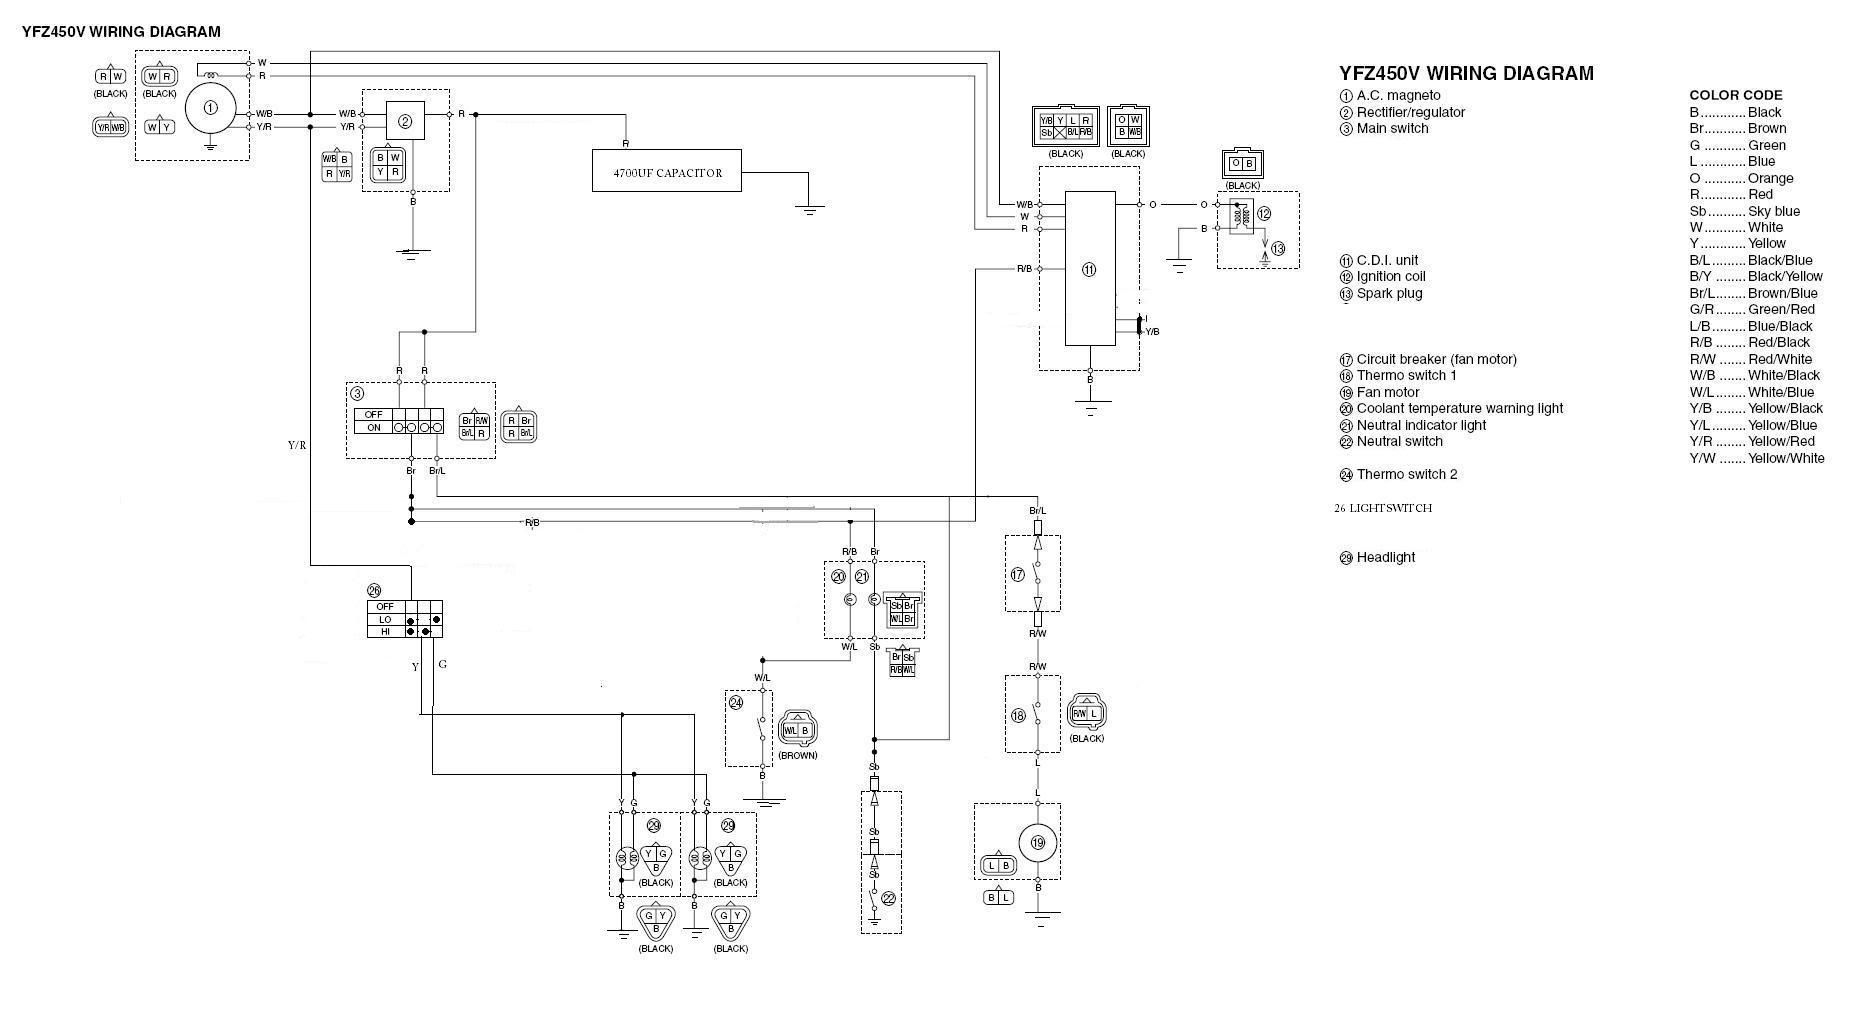 medium resolution of gutted harness diagrams yamaha yfz450 forum yfz450r throughout 05 yamaha yfz 450 wiring harness